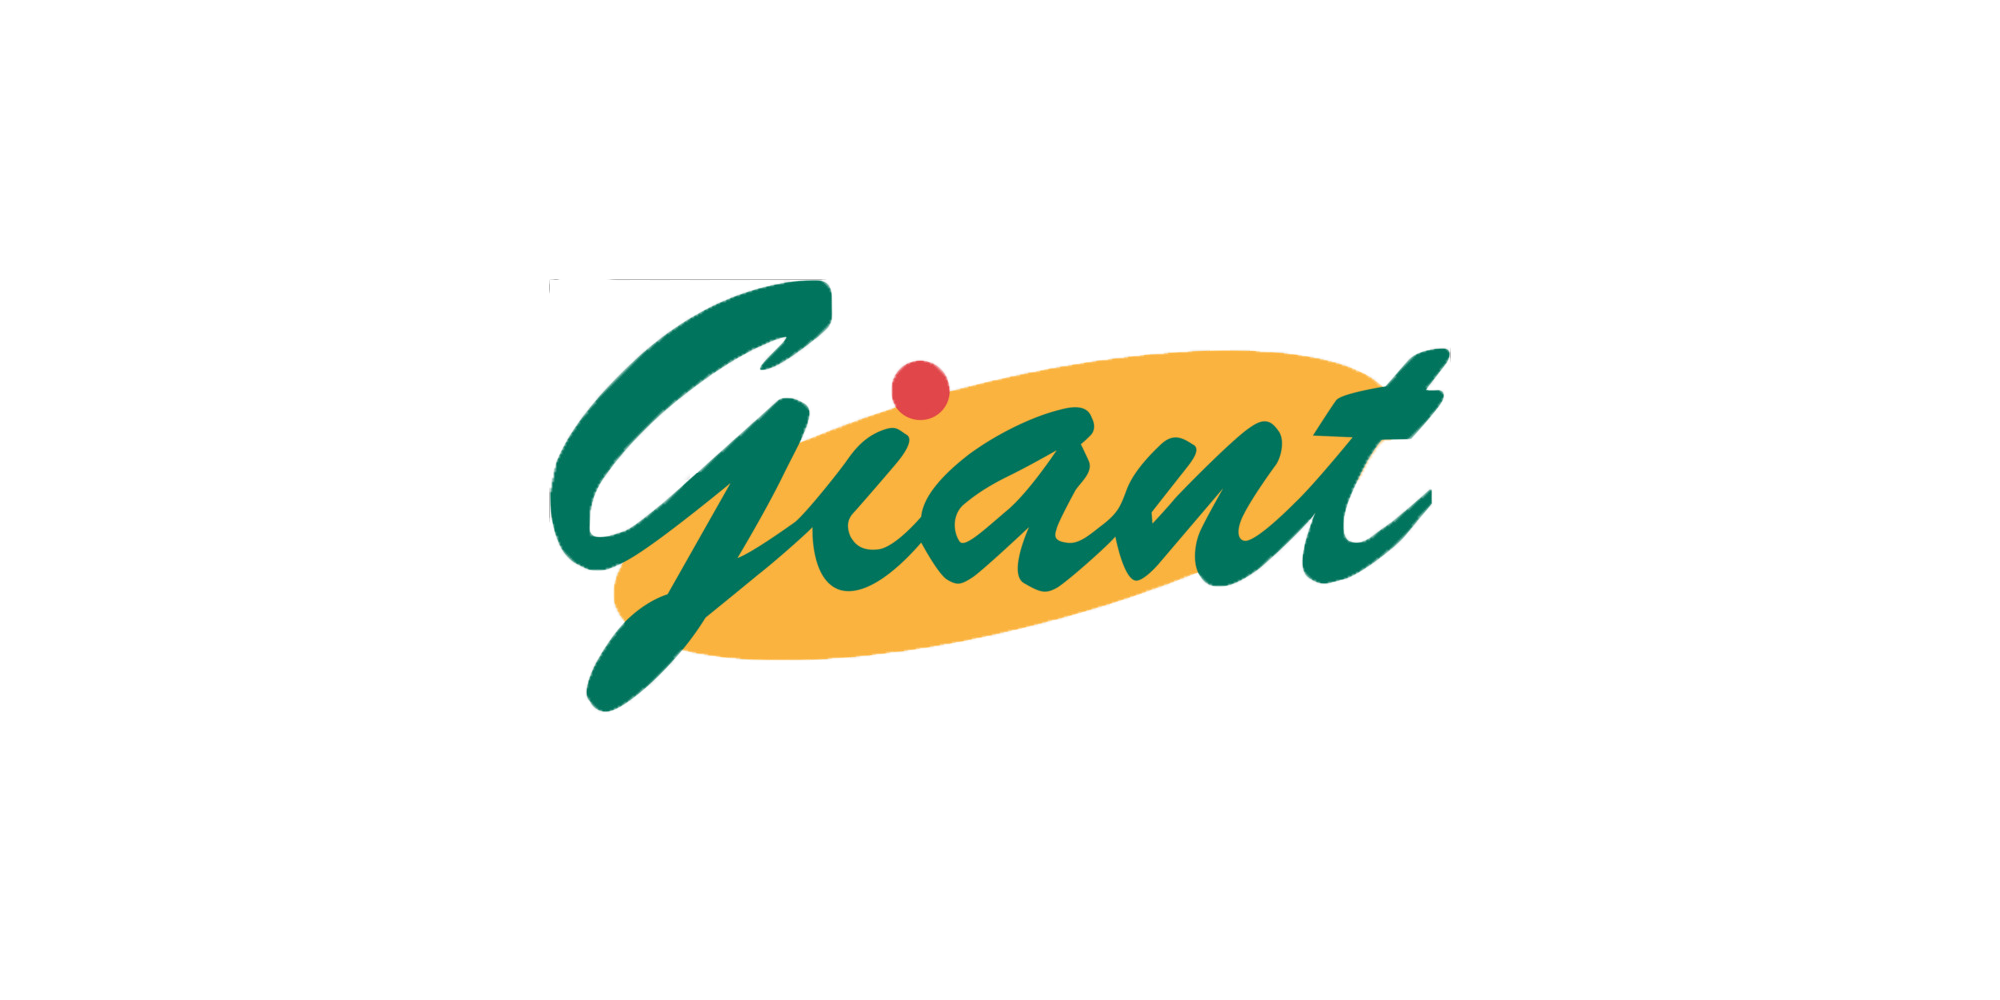 kisspng-giant-landover-giant-hypermarket